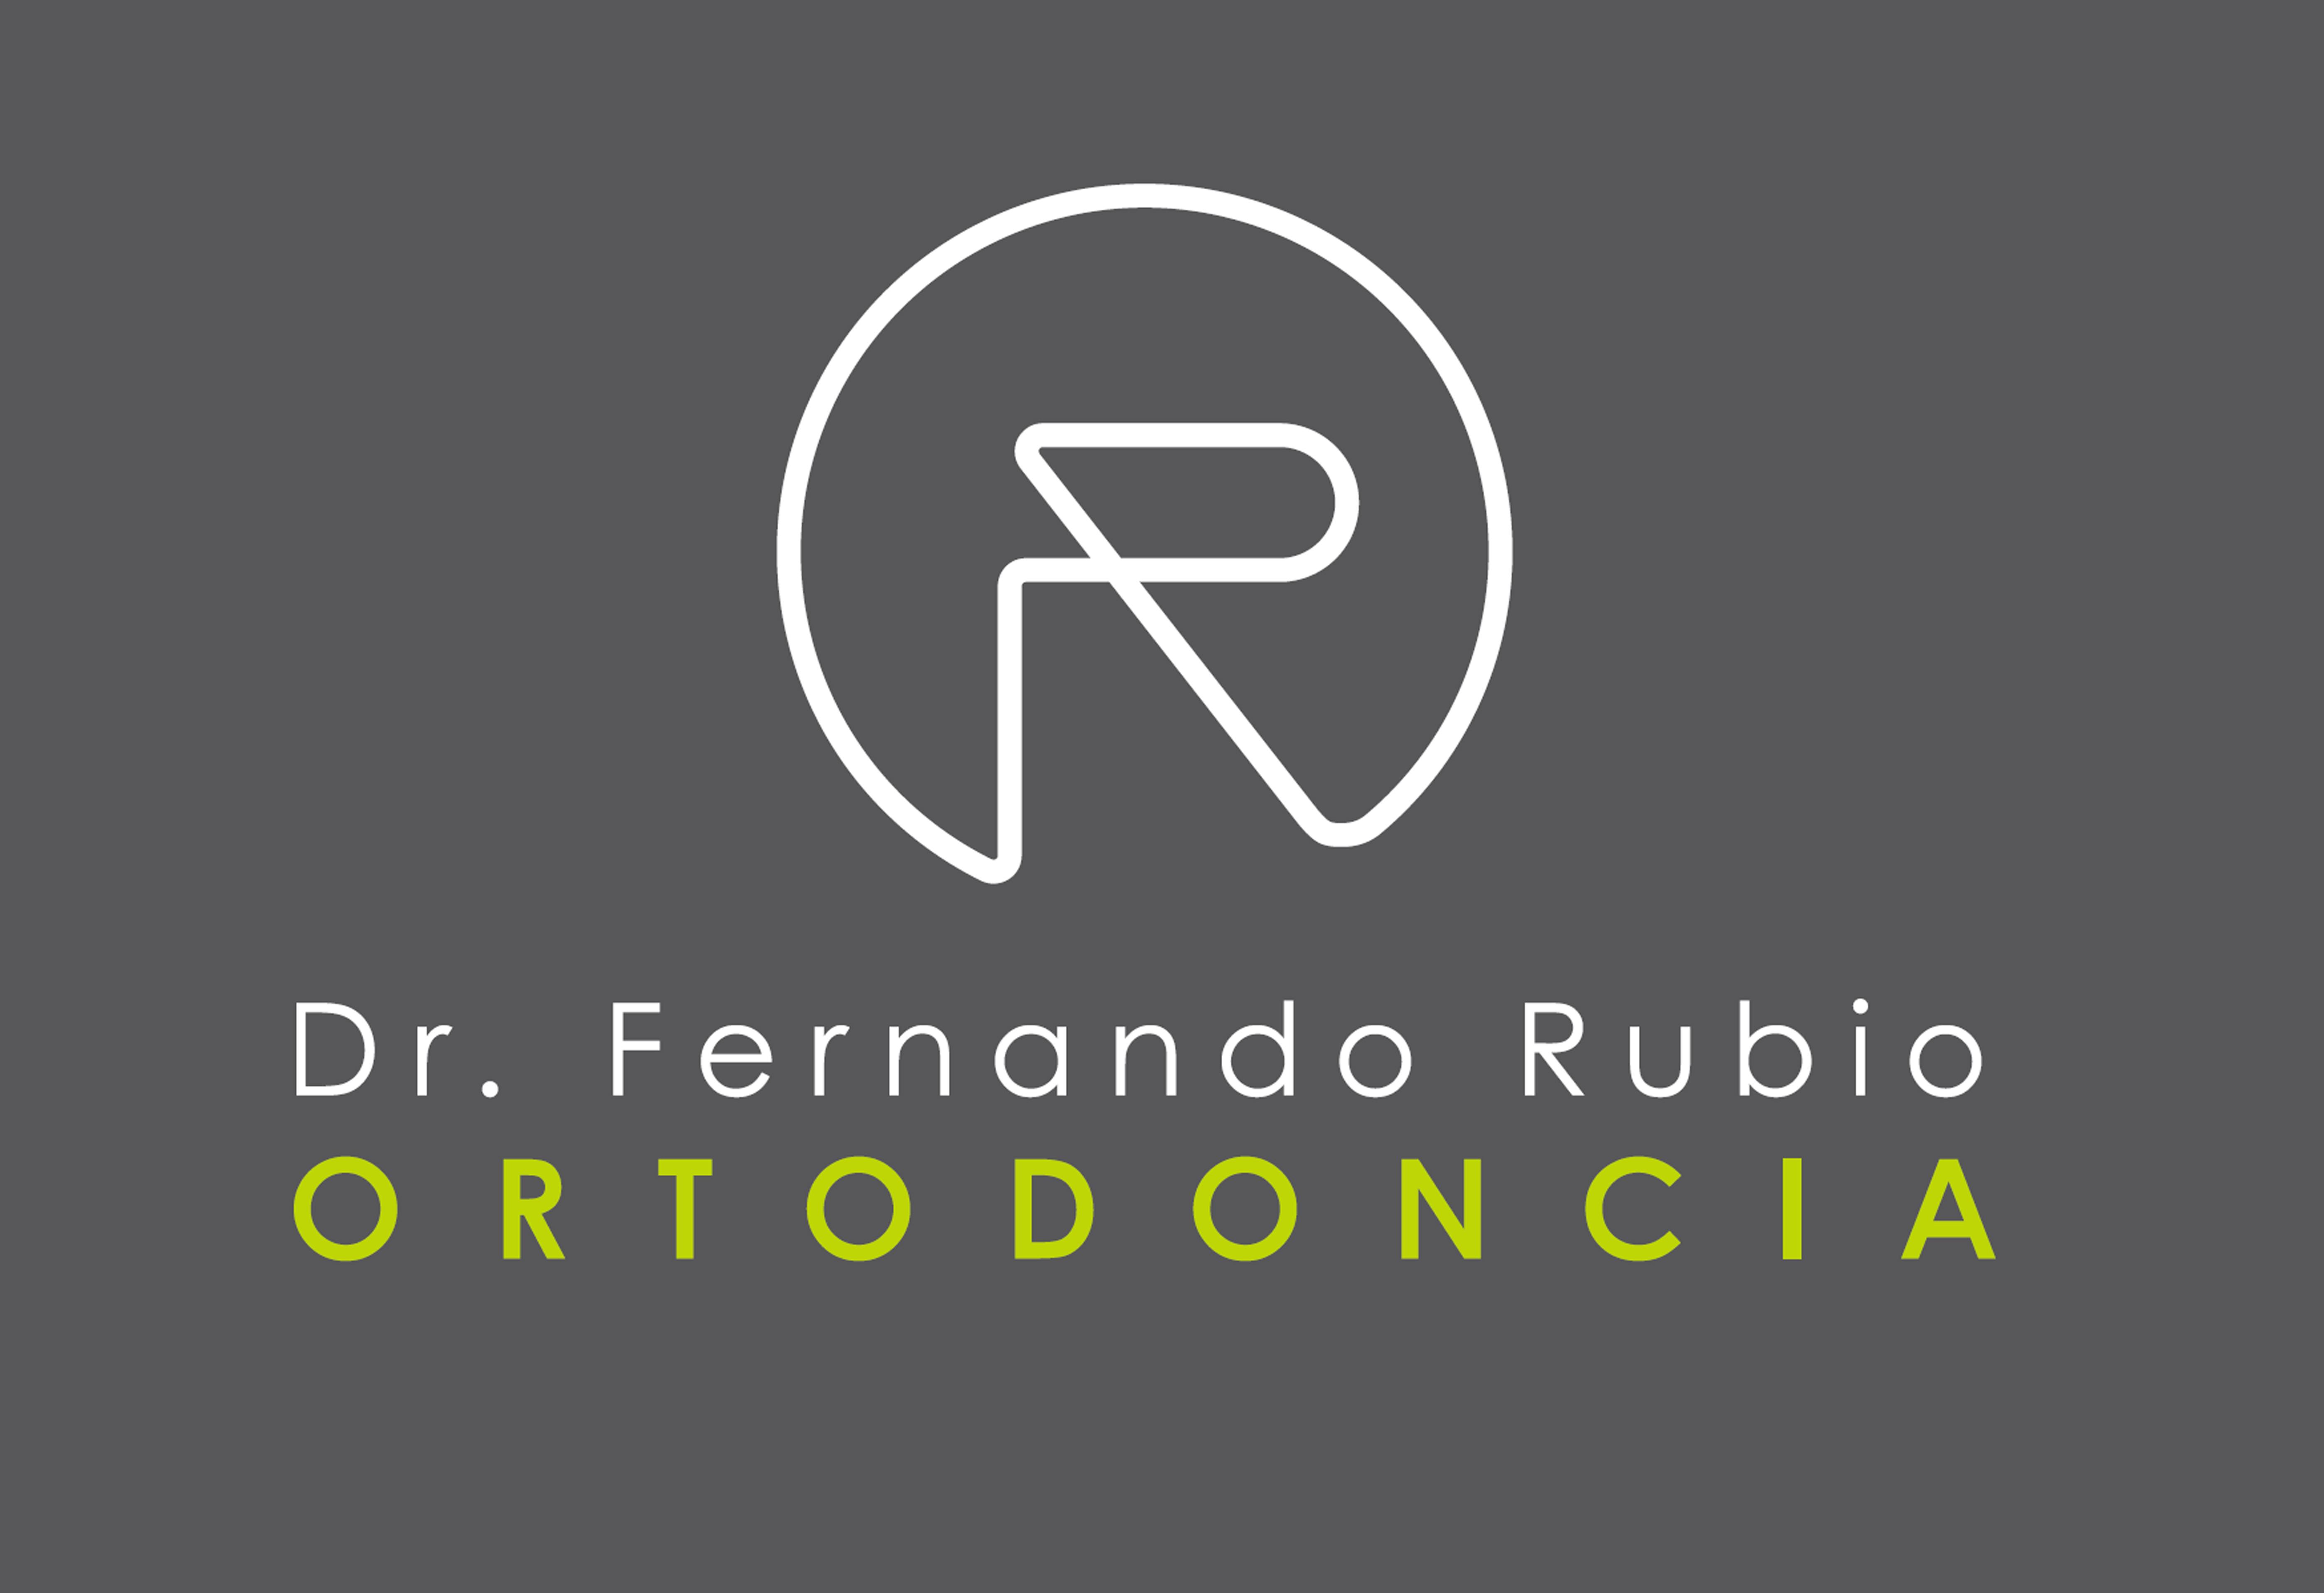 Fernando Rubio Ortodoncia